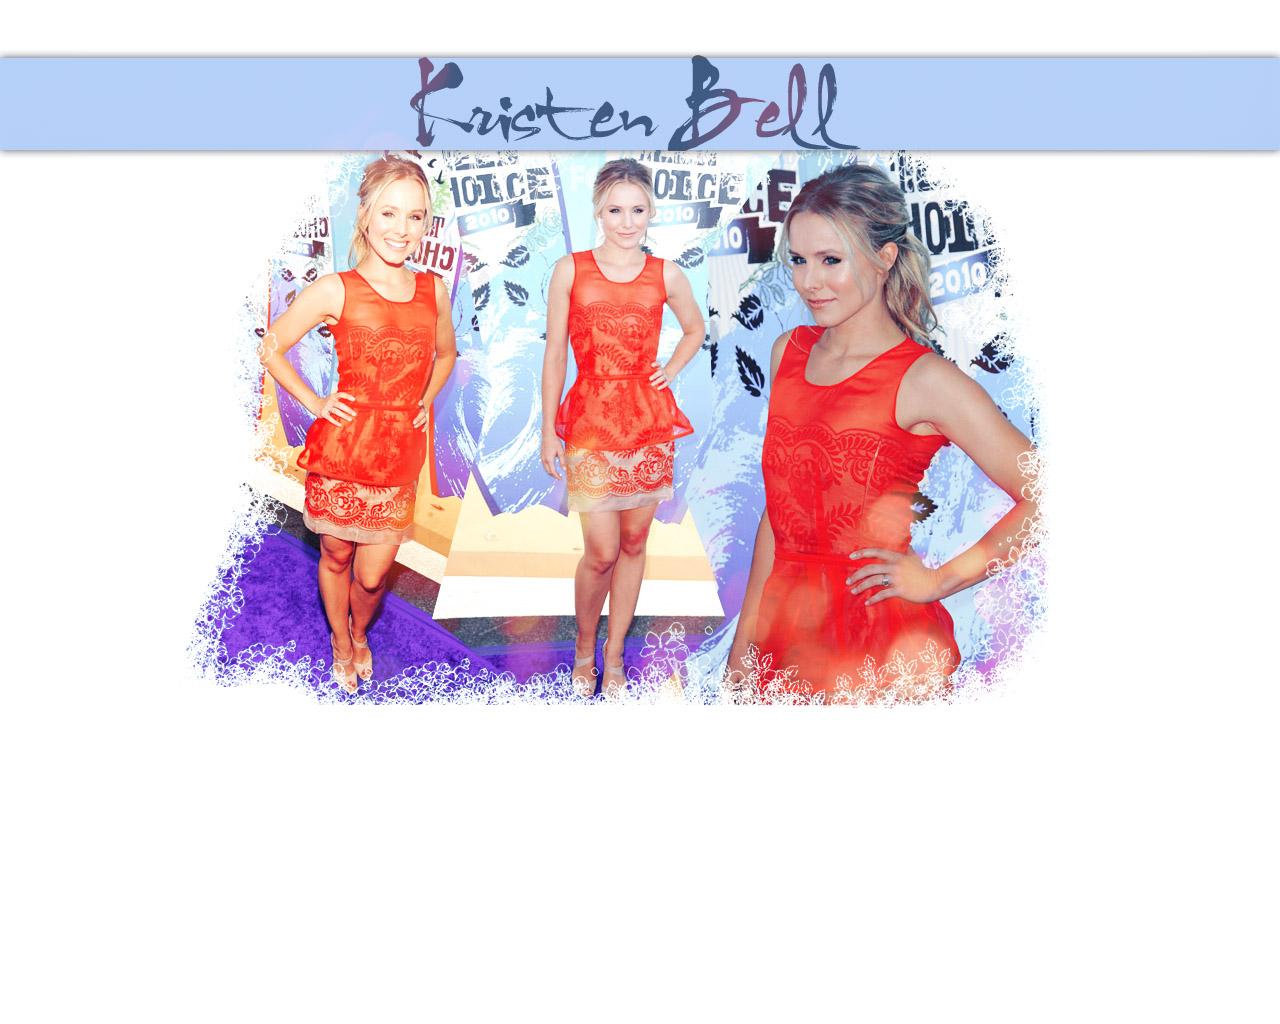 Kristen Bell on Teen Choice